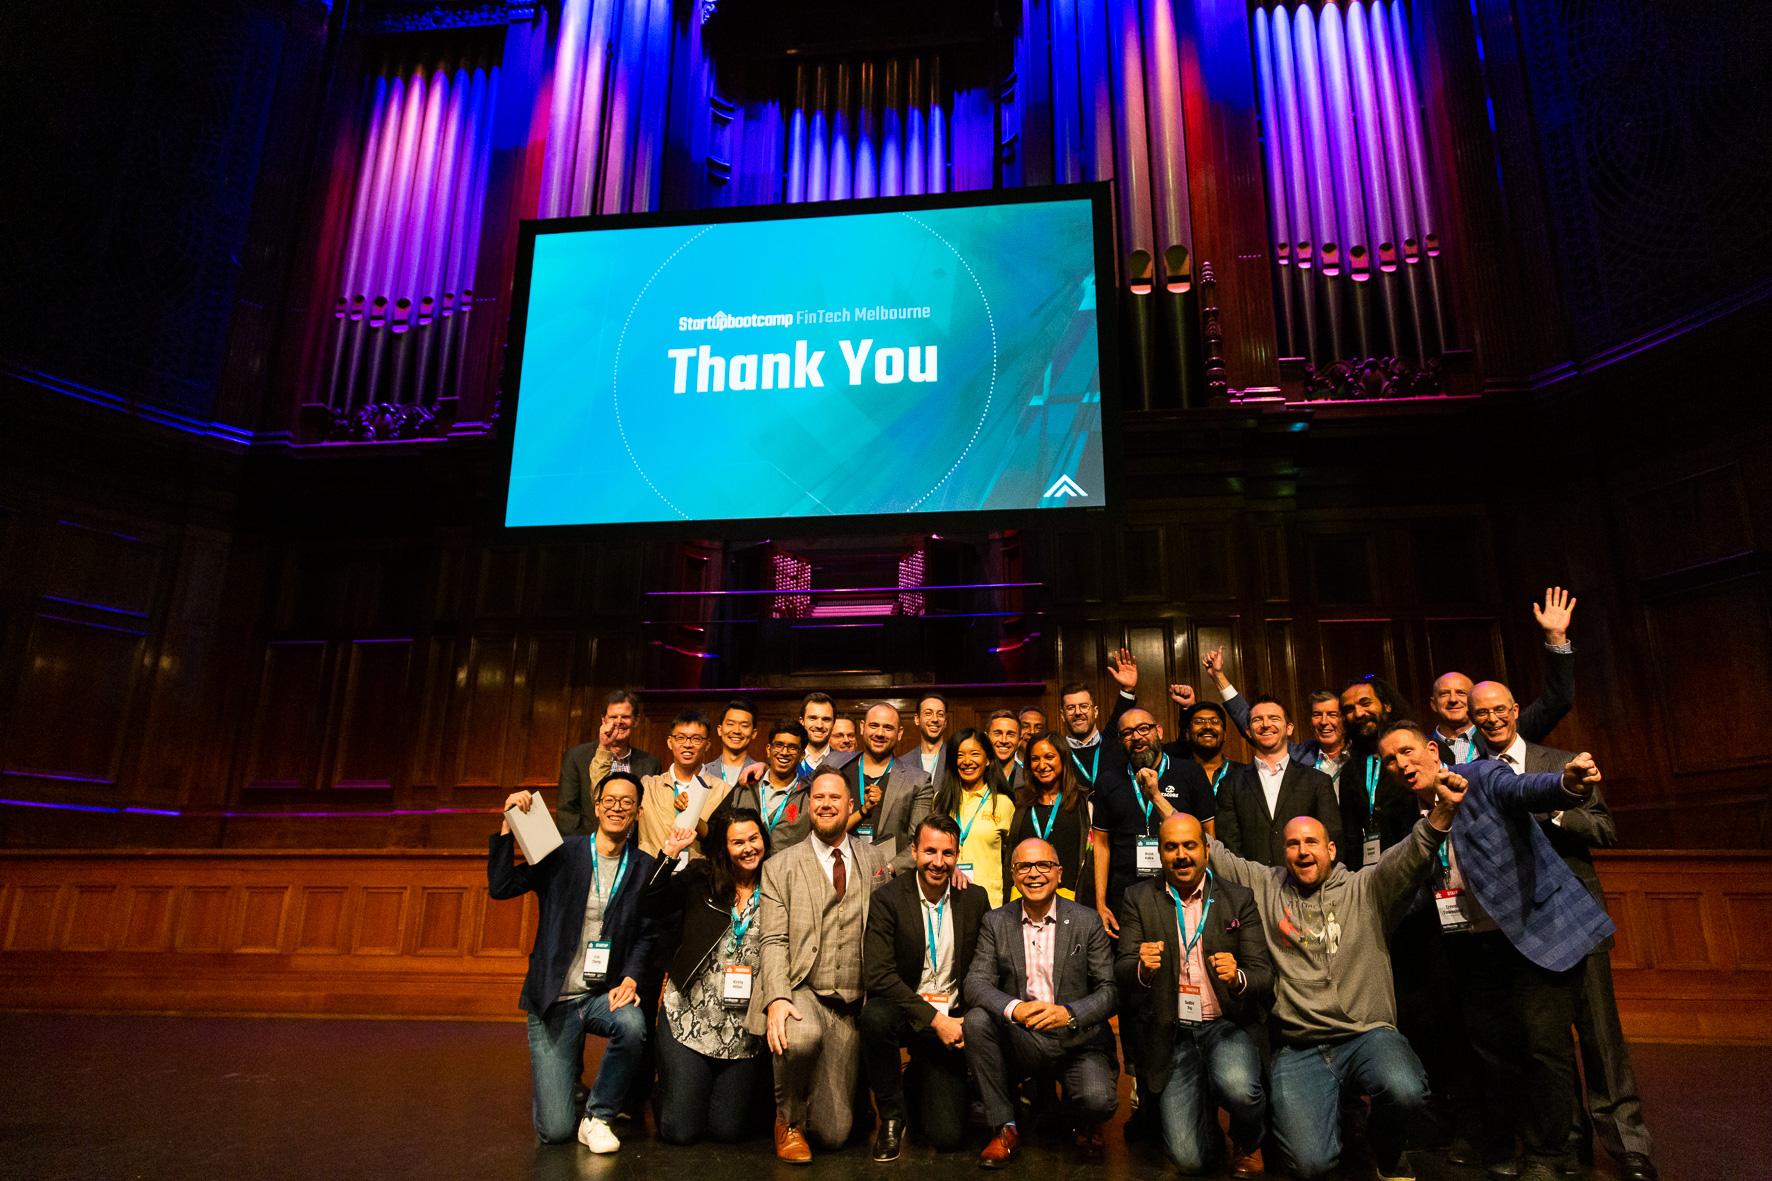 Heads up! Startupbootcamp Australia launches World Tour to